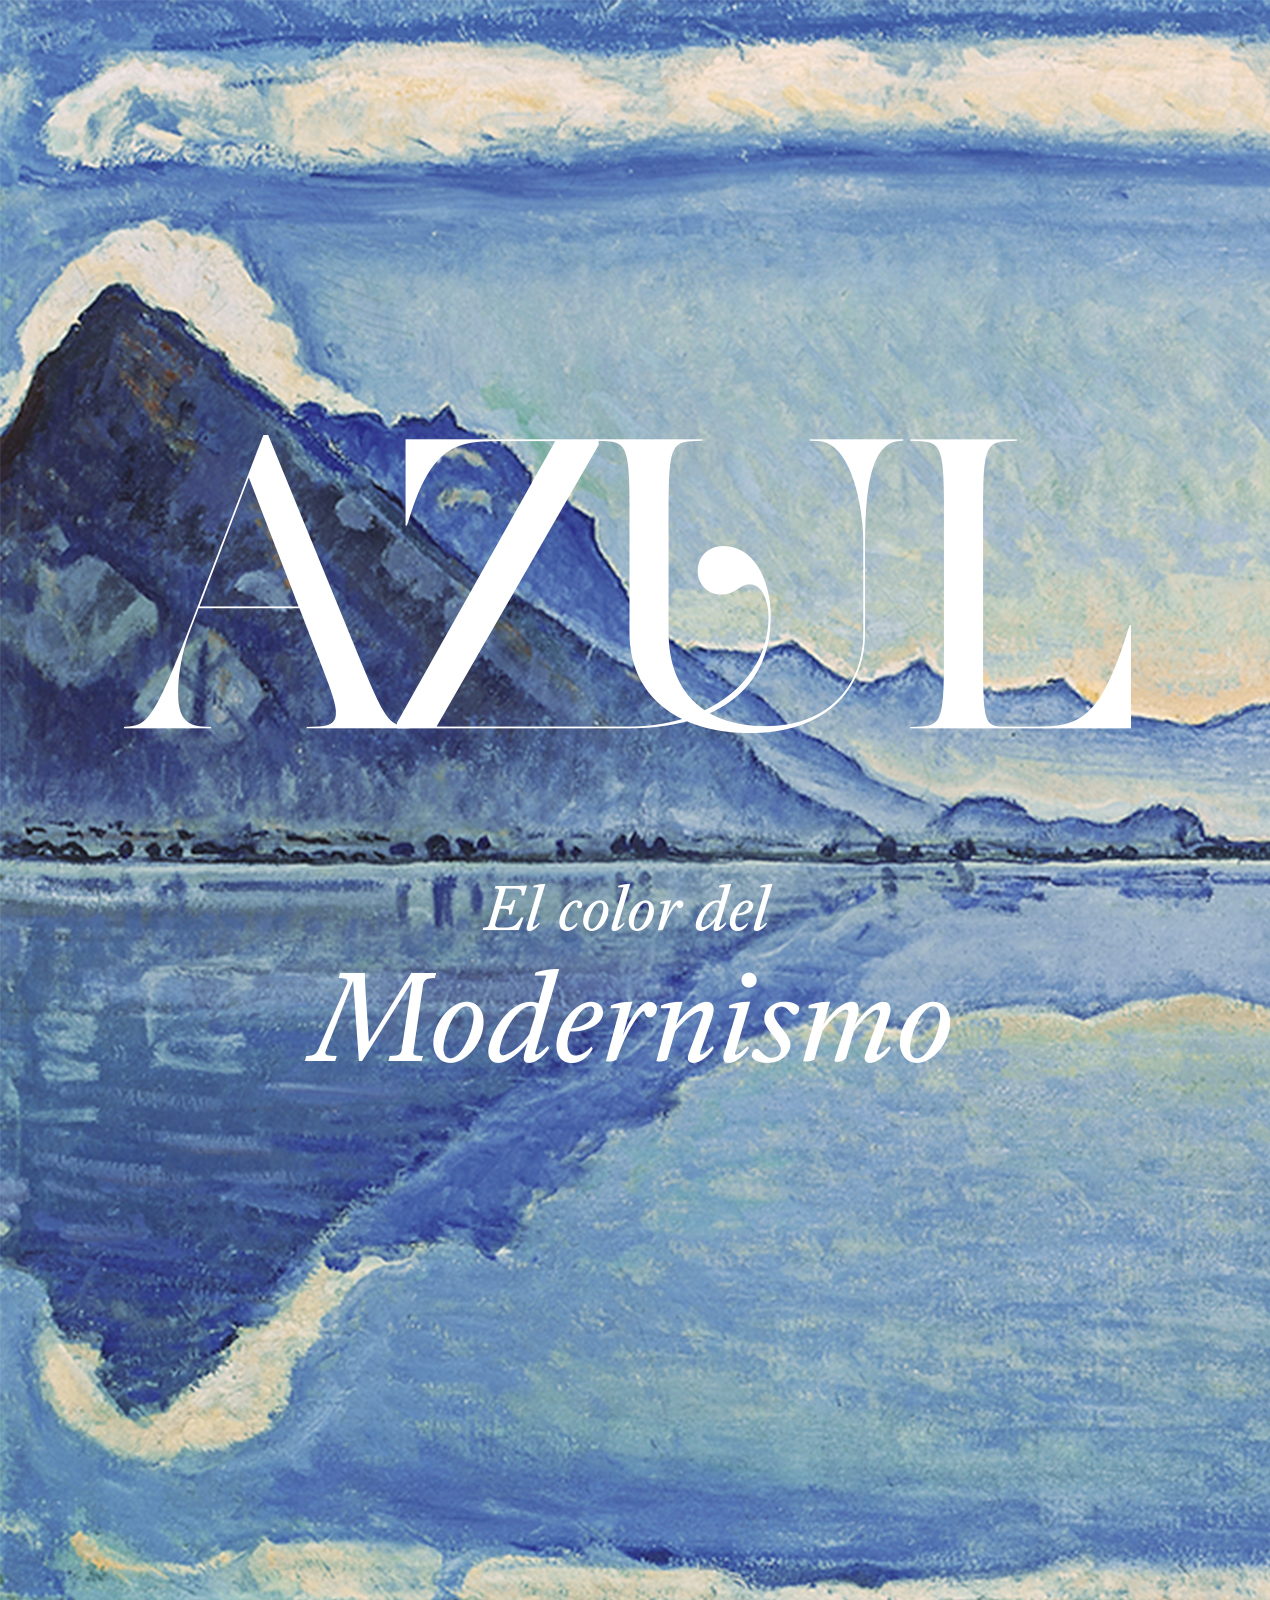 Exposición Azul en Color del Modernismo en Caixa Forum Sevilla